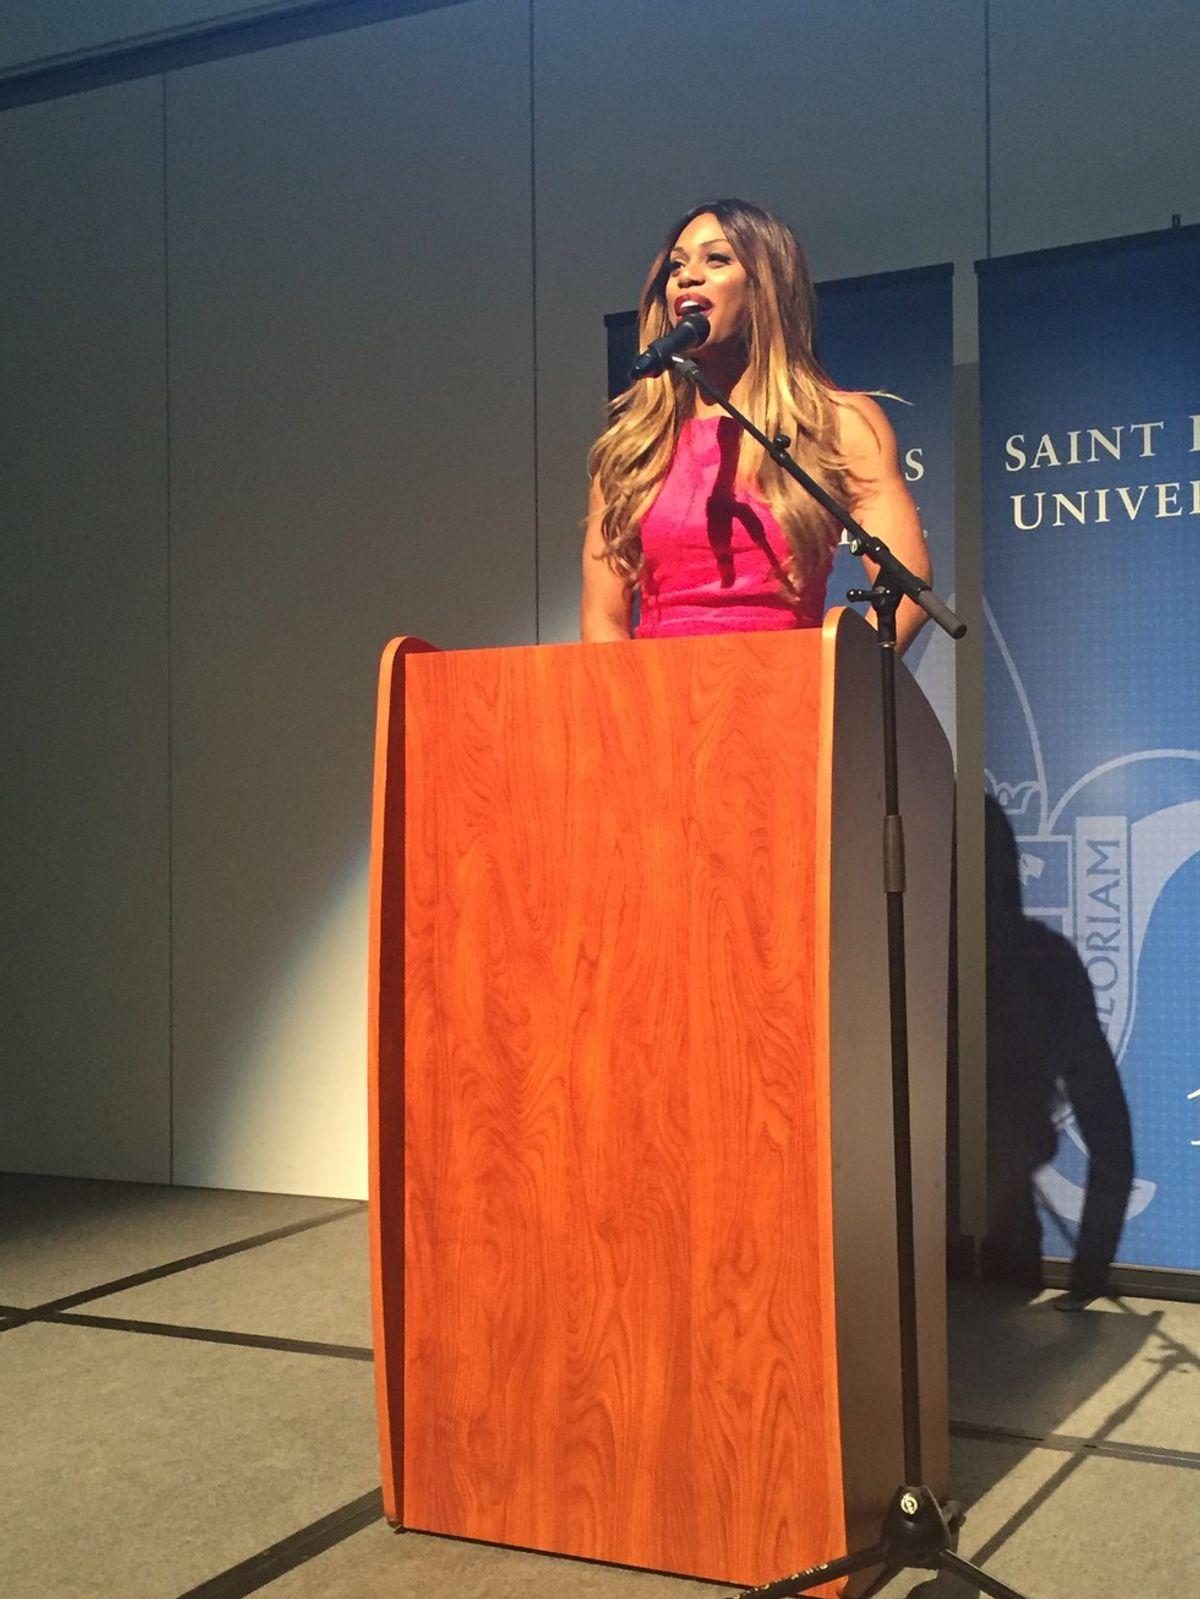 Laverne Cox Tells SLU Students Her Story